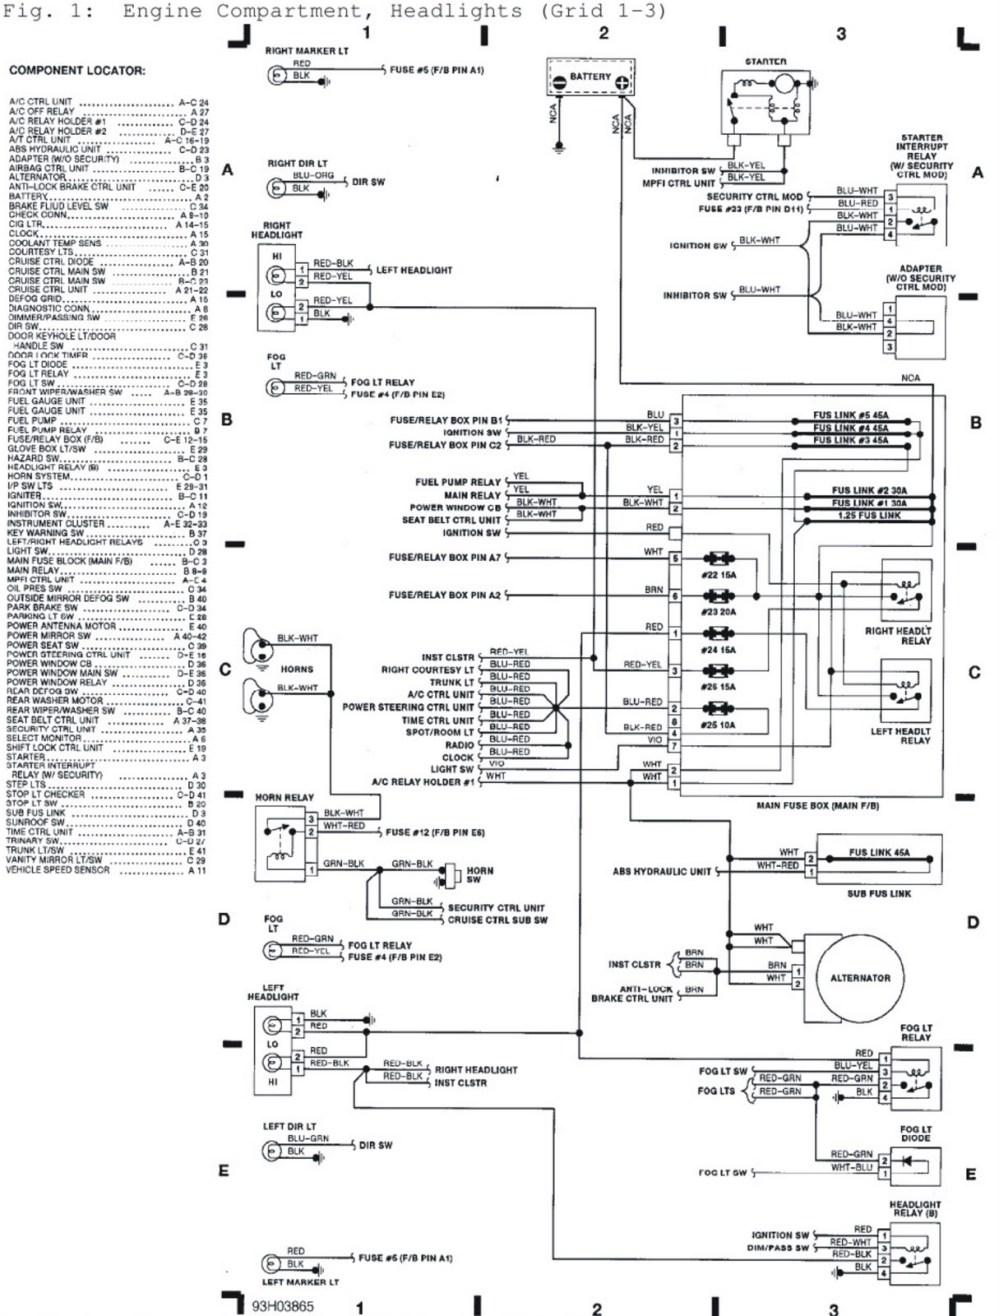 medium resolution of 1997 subaru legacy engine diagram diagram subaru legacy engine diagram of 1997 subaru legacy engine diagram